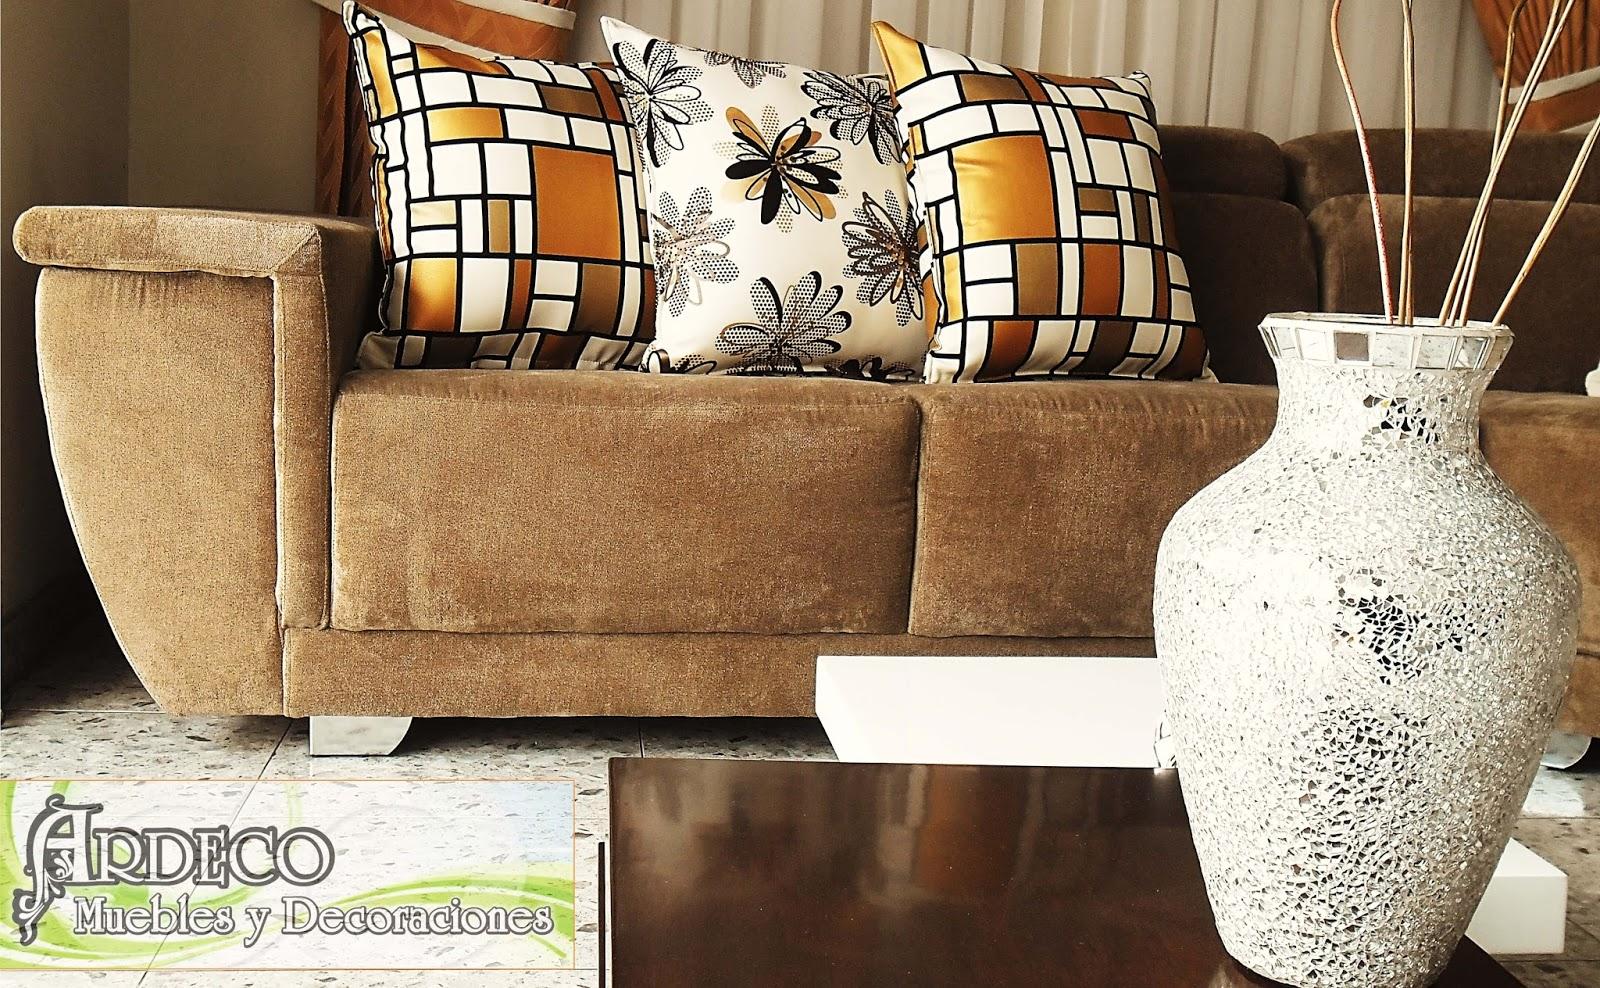 Ardeco muebles tulua c mo escoger la tela para tus muebles for Tela para forrar muebles